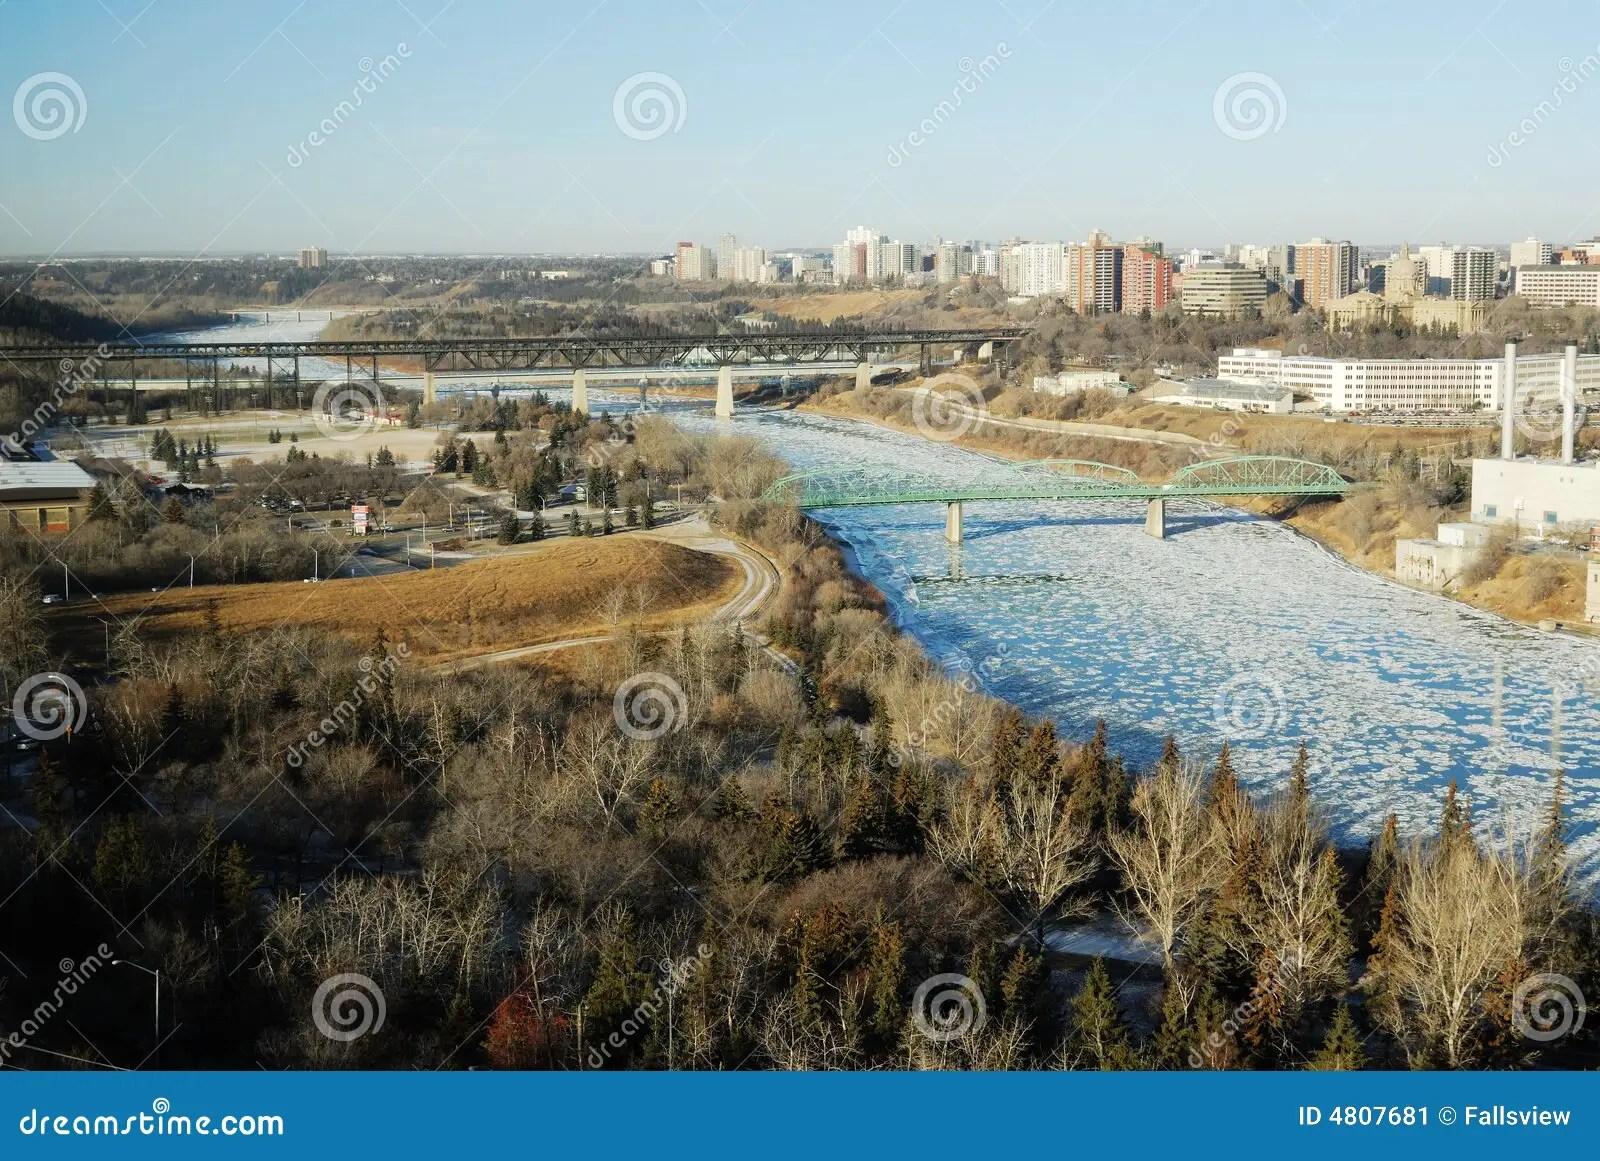 Winter River Valley View In Edmonton Stock Image